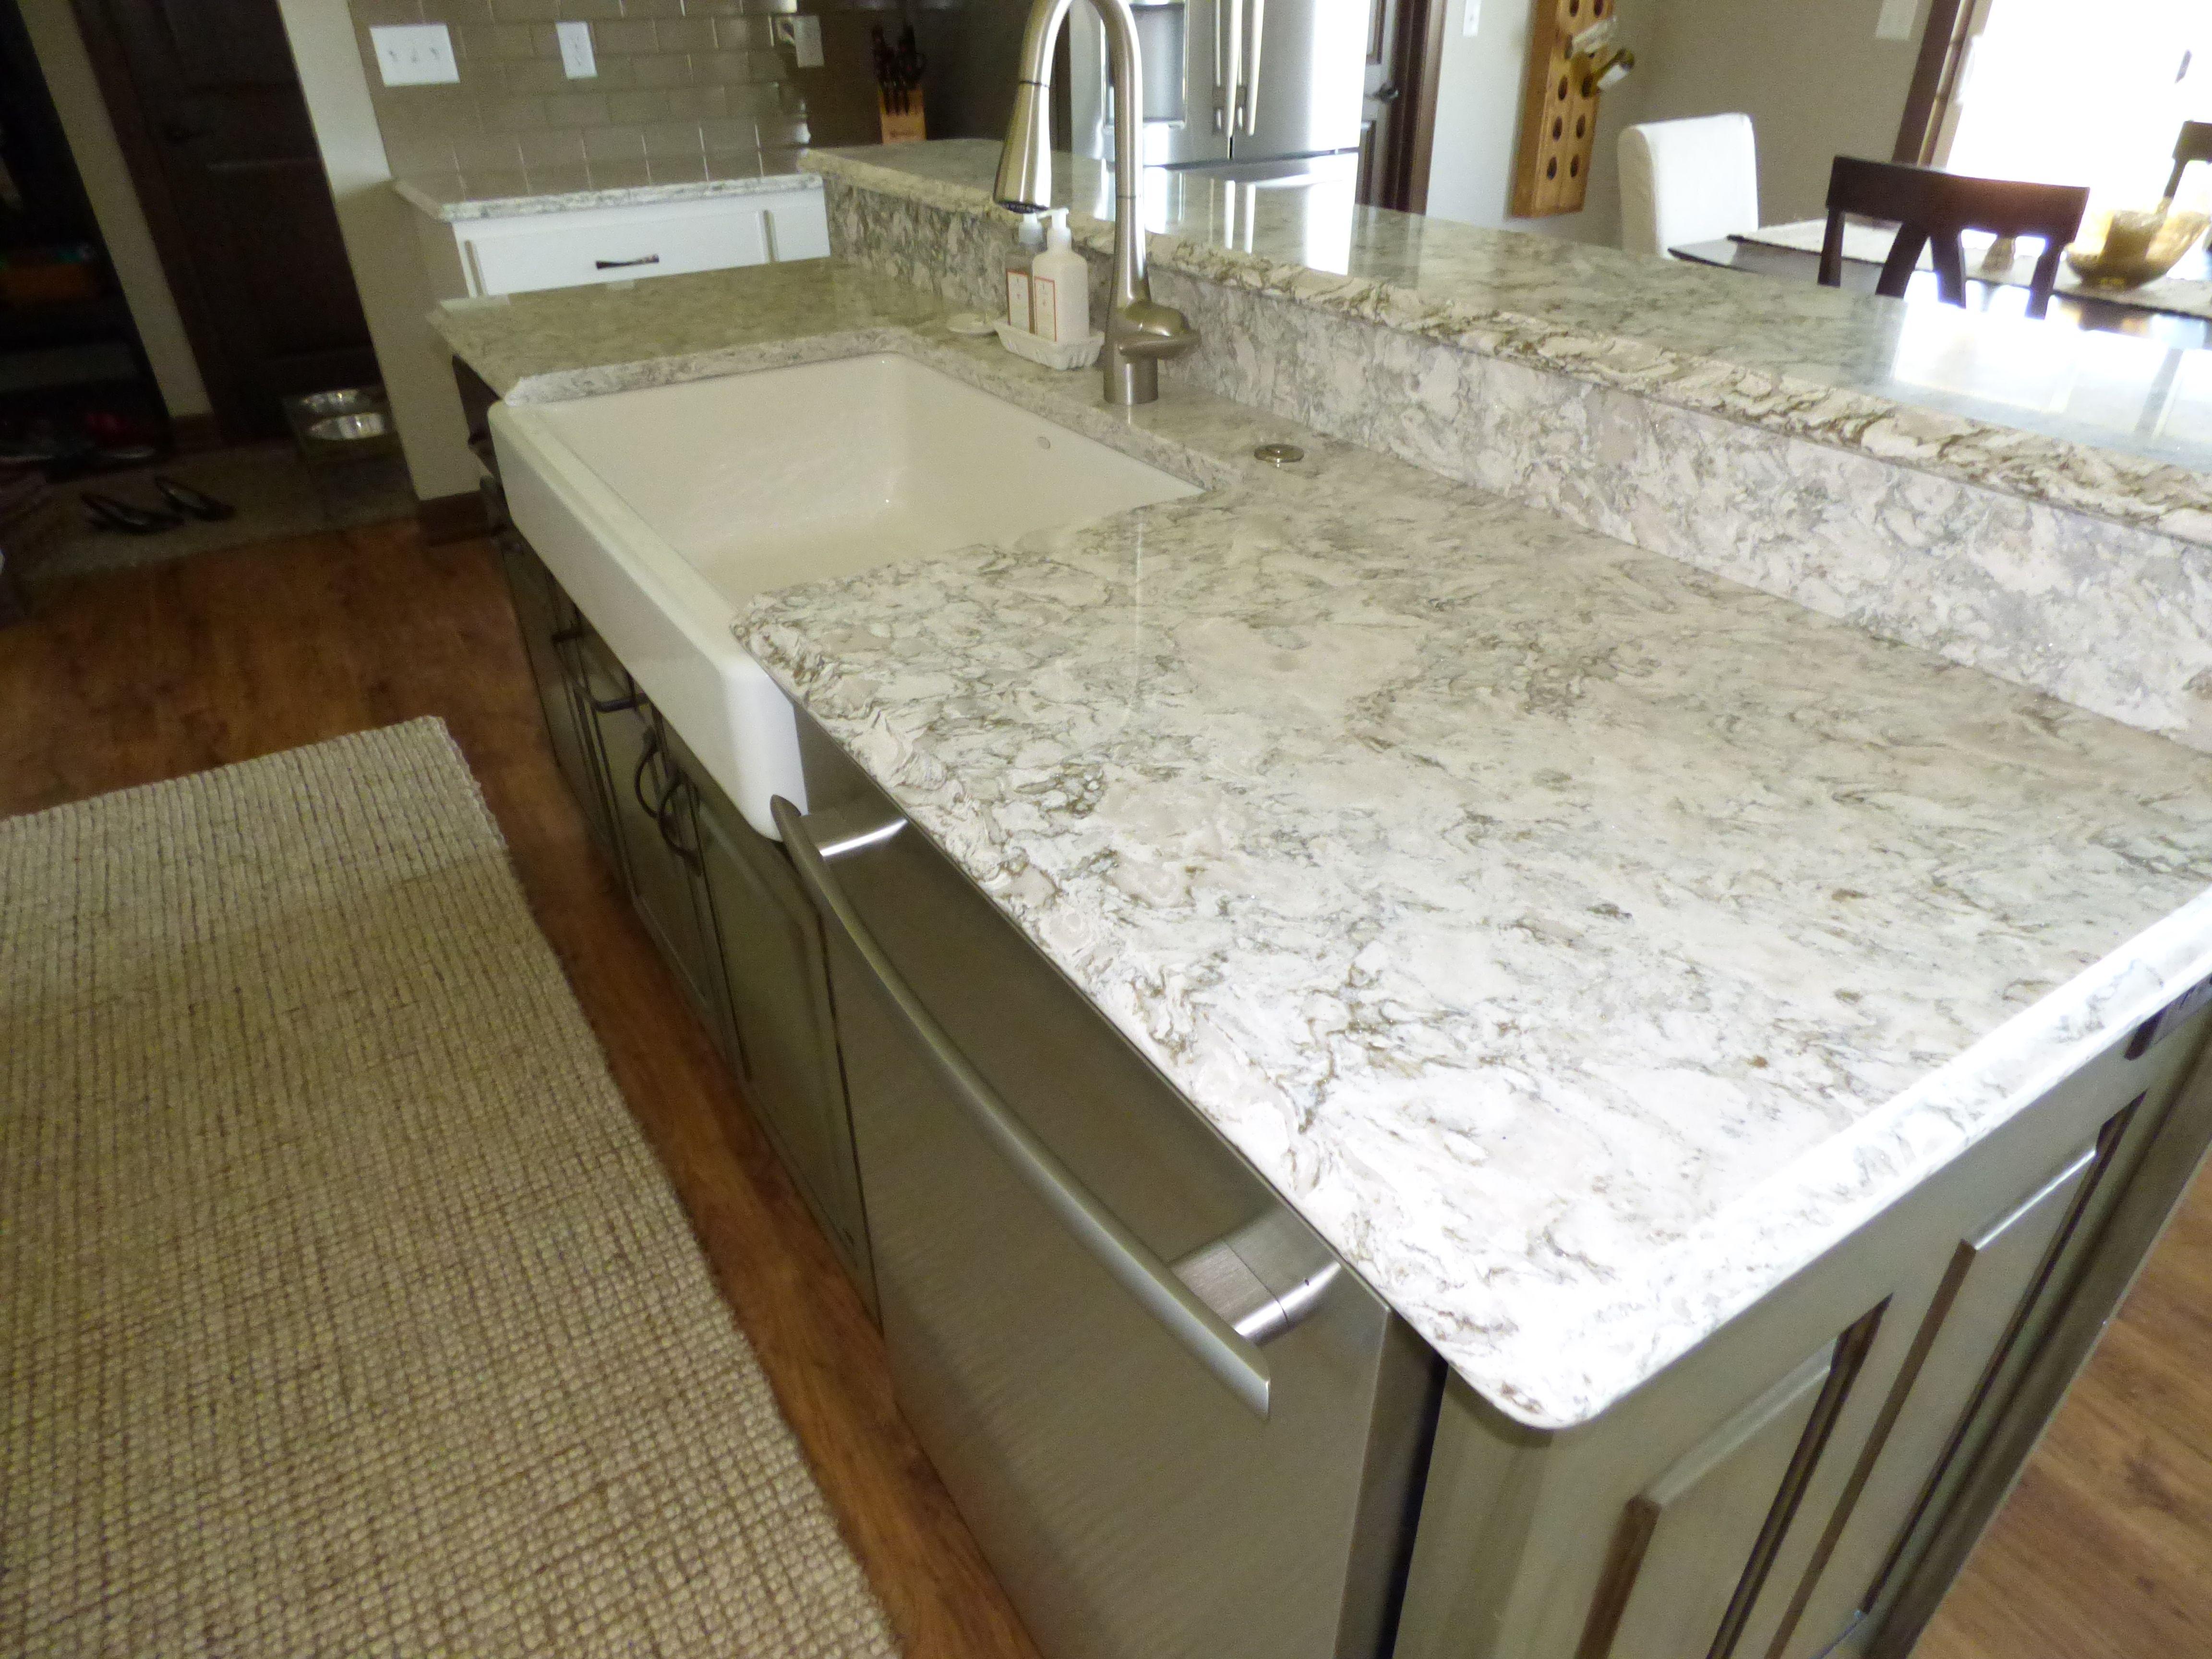 kitchens carrara naples home fl granite countertops gallery baths